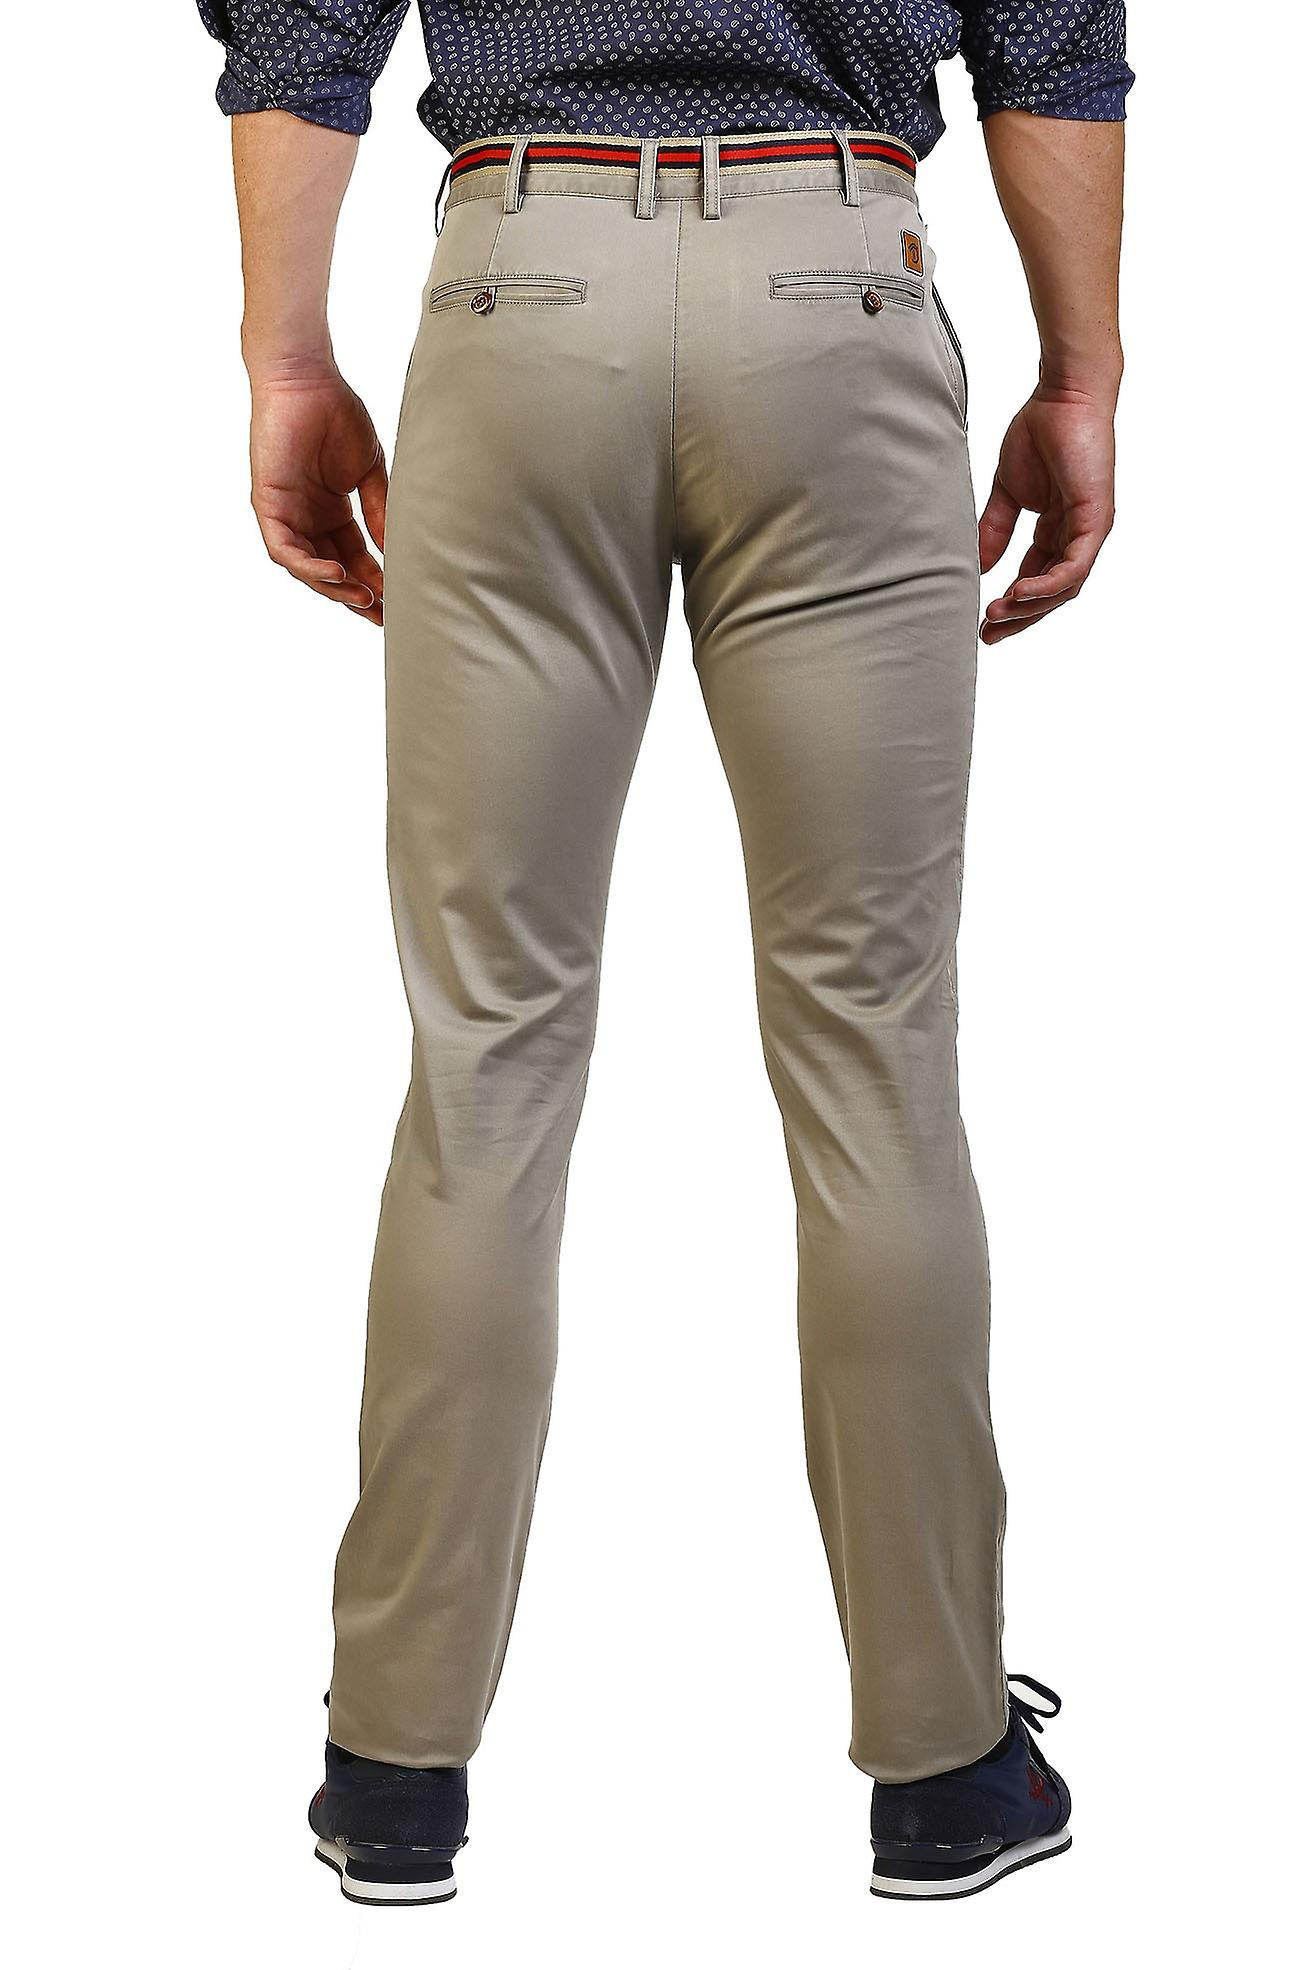 Pantalon Hombre The Time Of Bocha JI1PPOLO-110-Gris 714